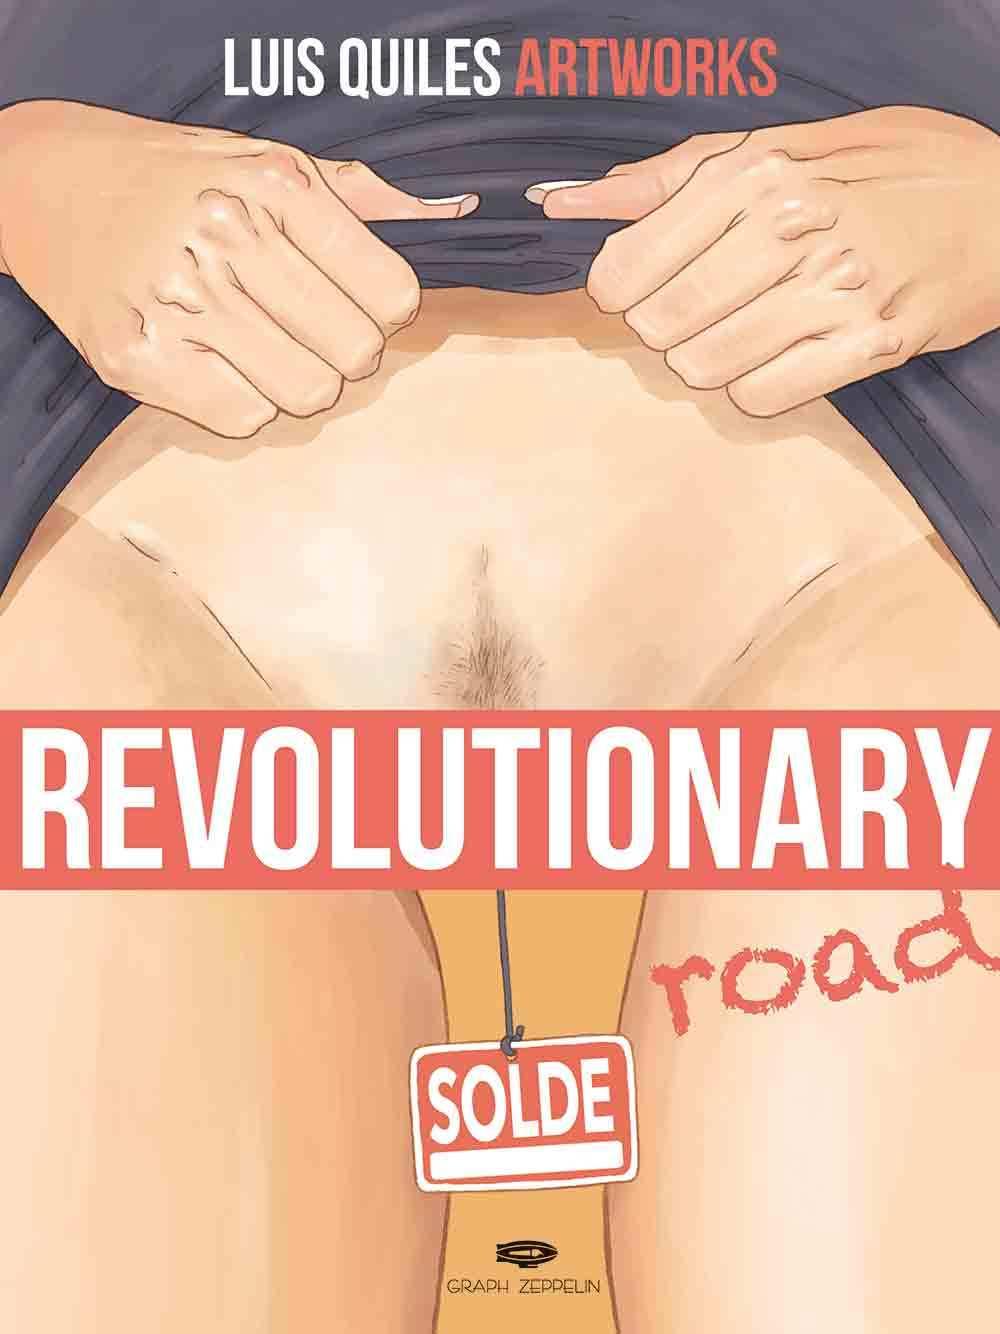 REVOLUTIONARY ROAD L'ART SUBVERSIF DE LUIS QUILES